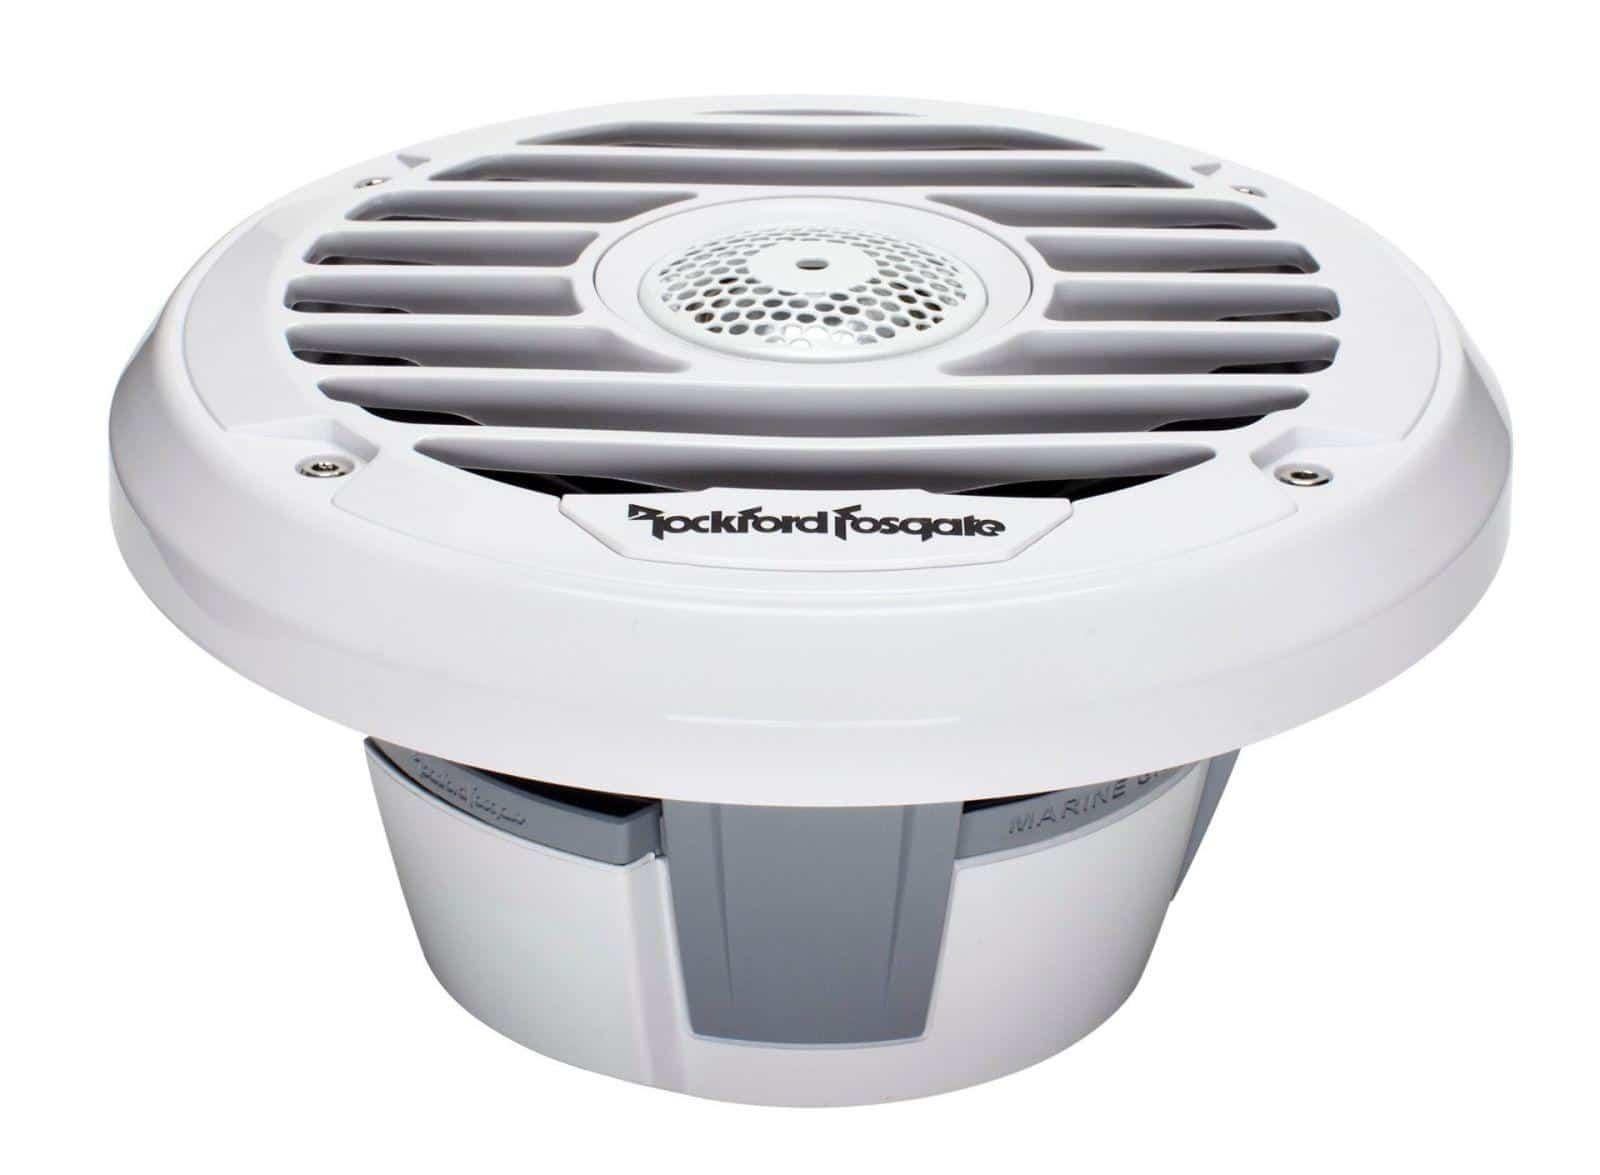 Rockford Fosgate PM262X4